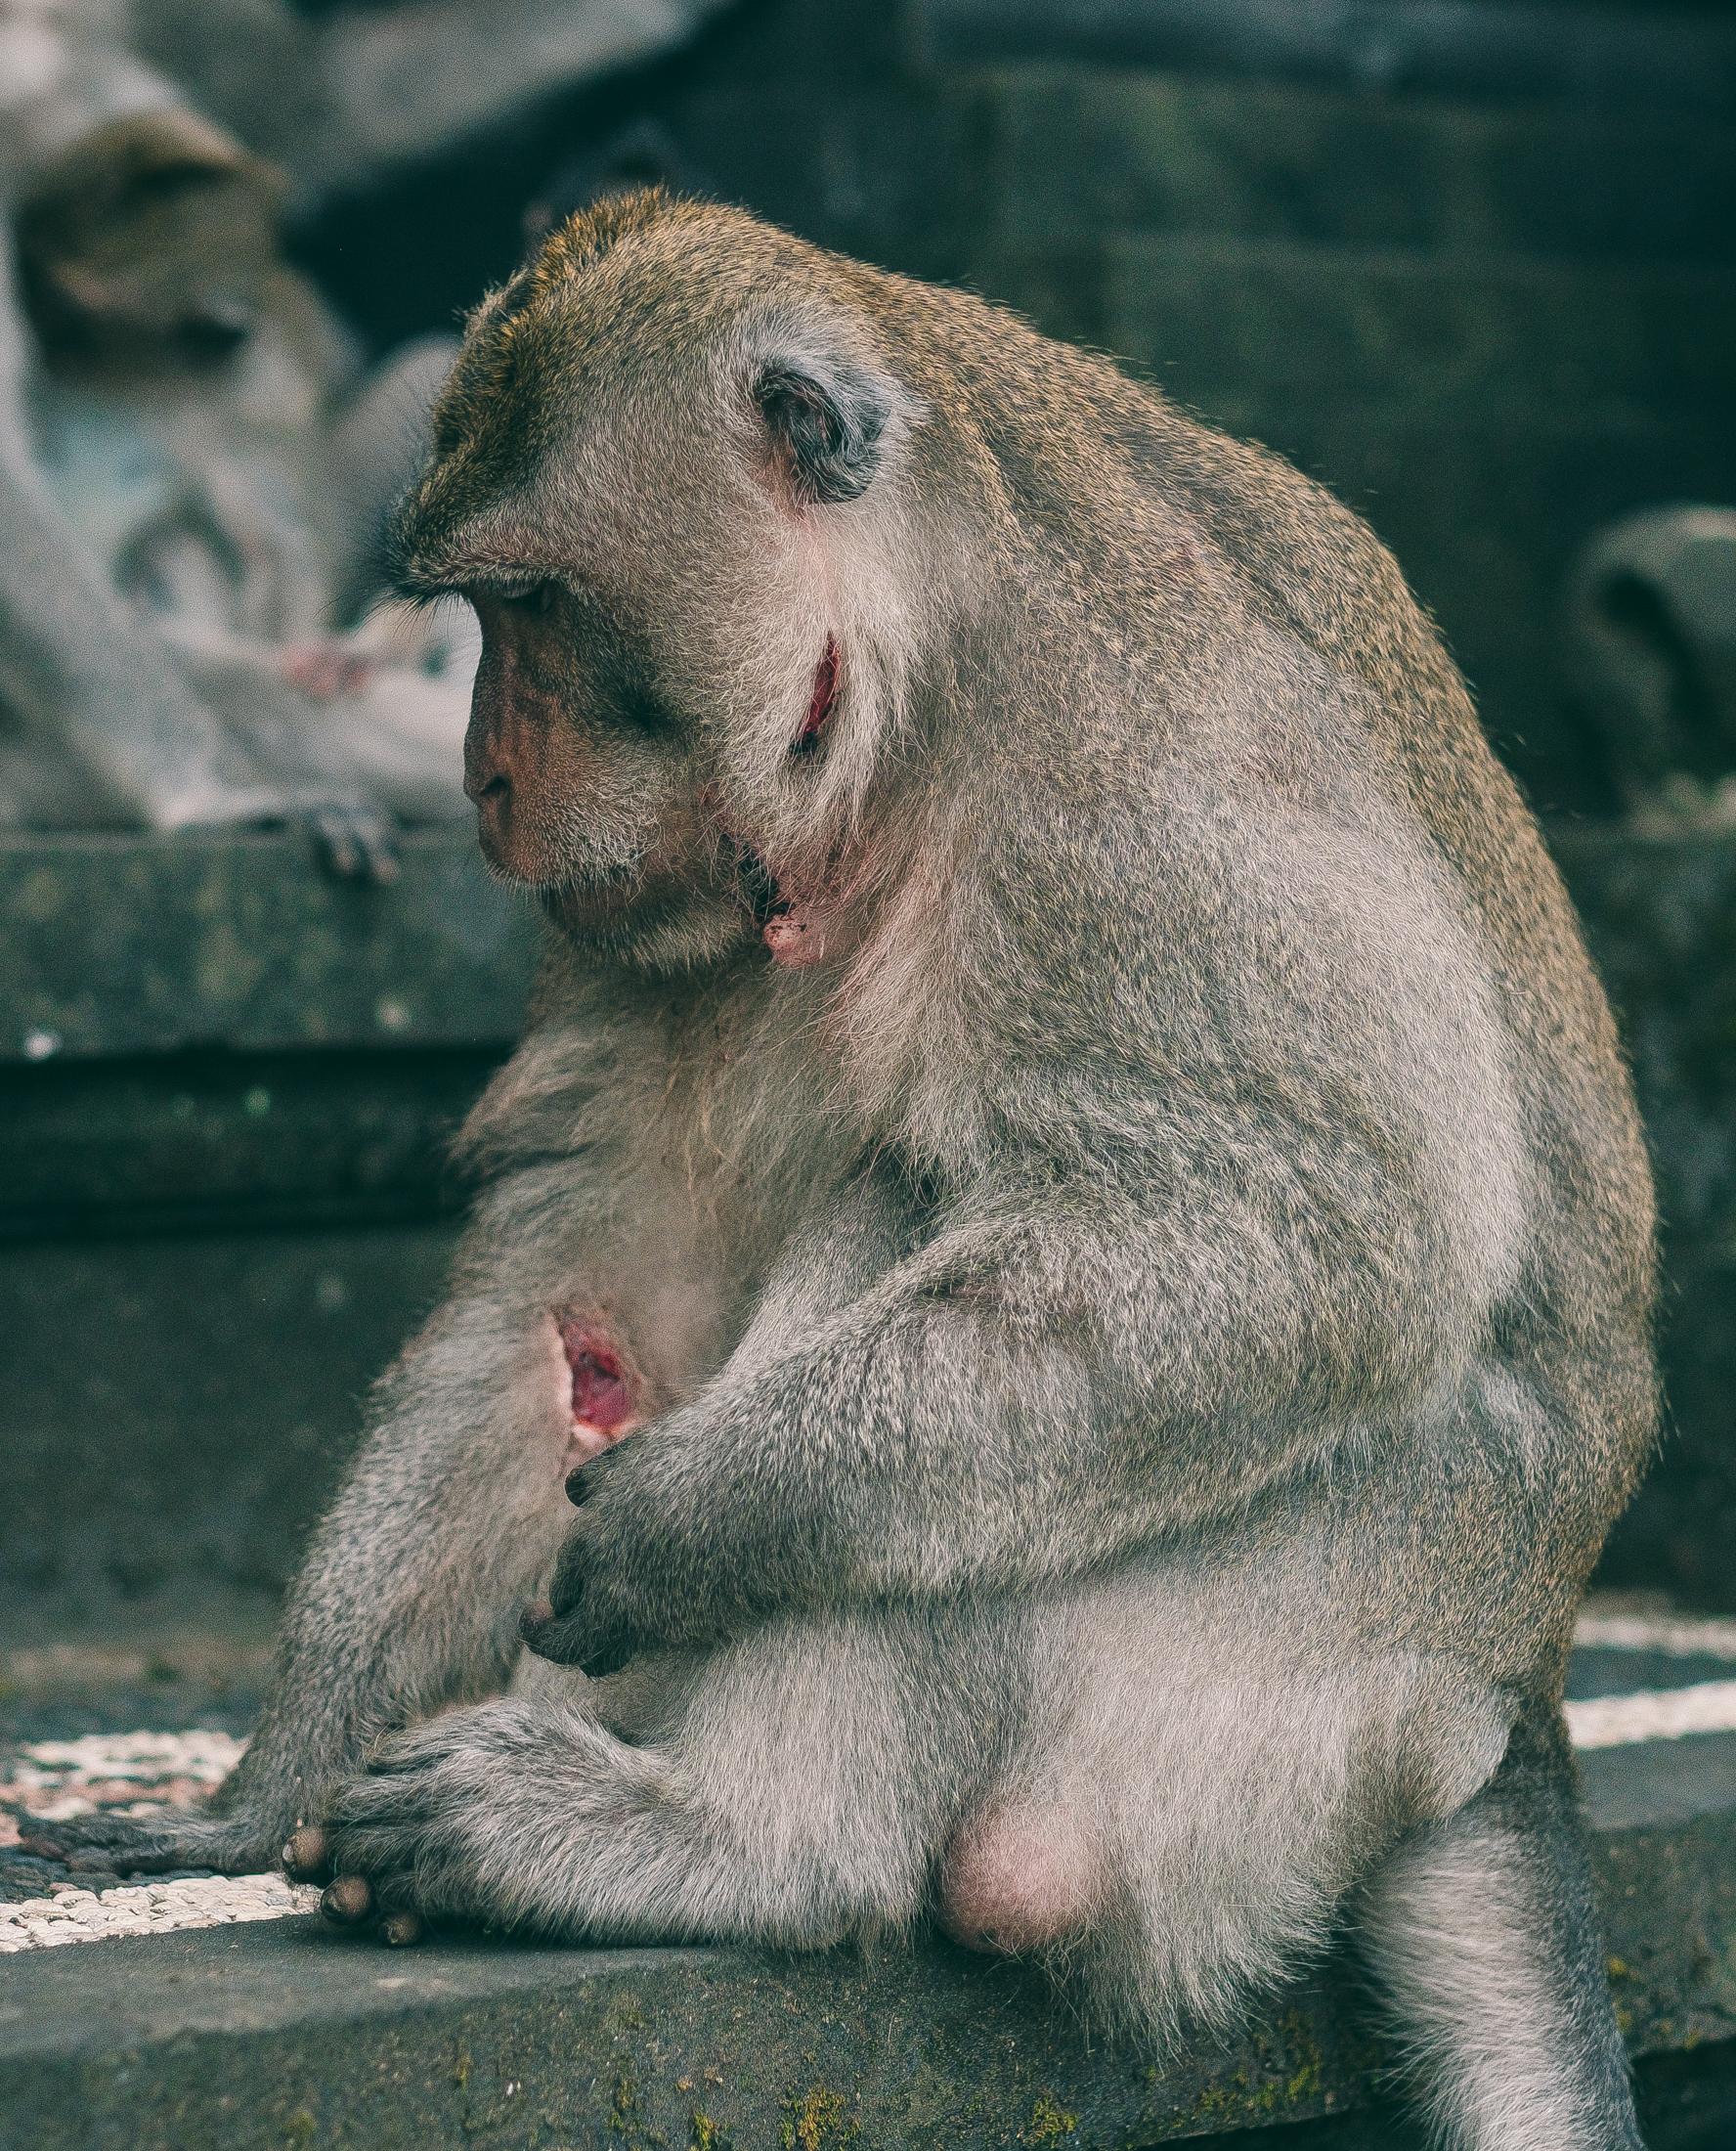 bali_day9_monkey-34.jpg